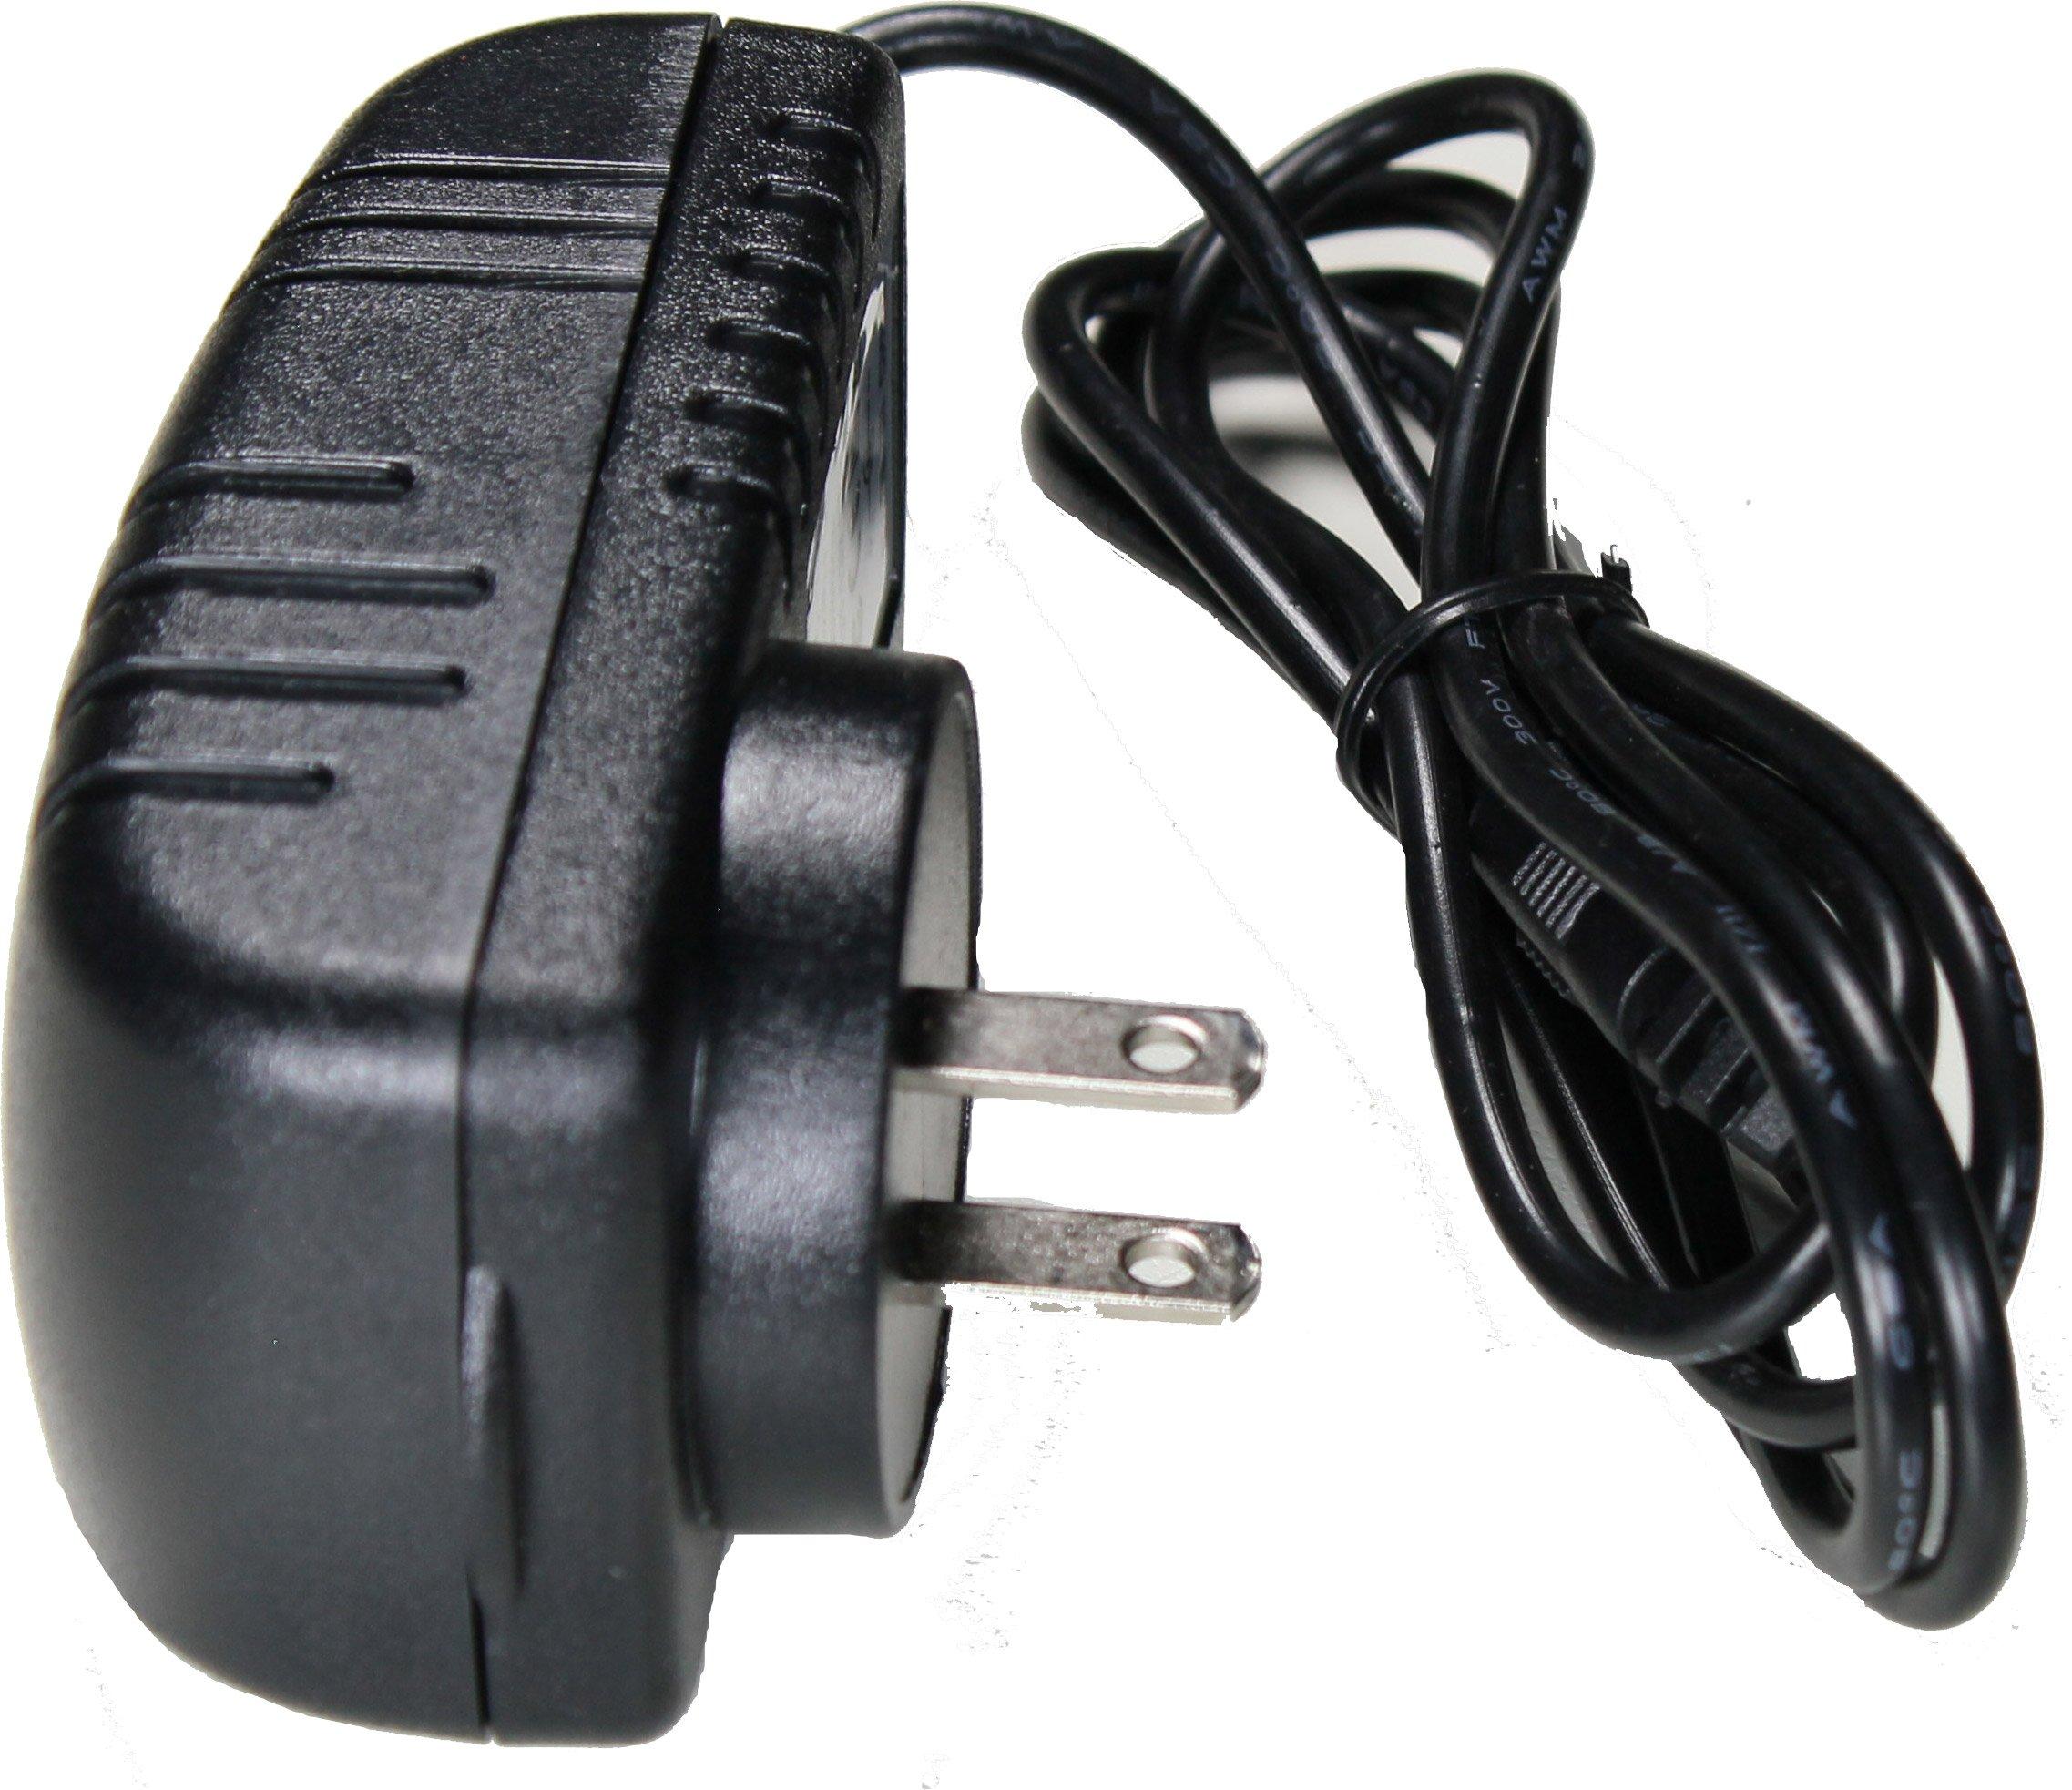 Super Power Supply AC / DC Adapter Charger Cord for Western Digital Dual-Option DA-24B12 AC, ADS-24P-12-2 1224G, ADS-24S-12 1224GPCU, WA-24C12U, S018BU1200150 USB External Hard Drives Wall Barrel Plug